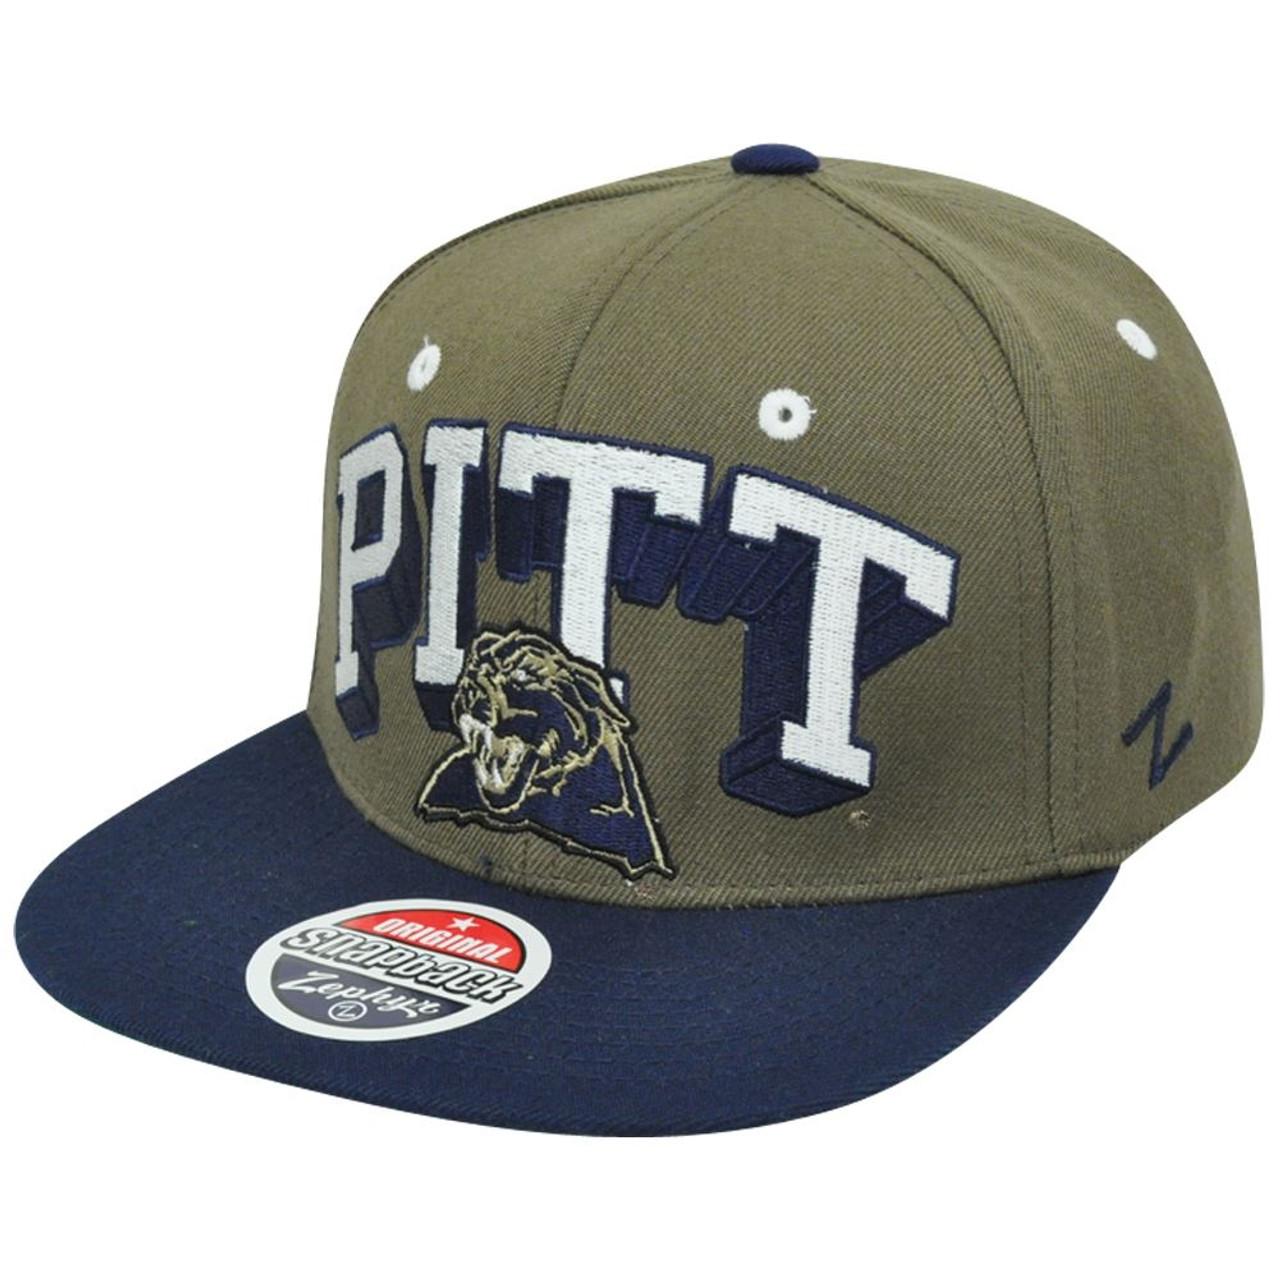 827edacbe NCAA Pittsburgh Panthers Pitt Zephyr Block Buster Snapback Flat Bill Hat Cap